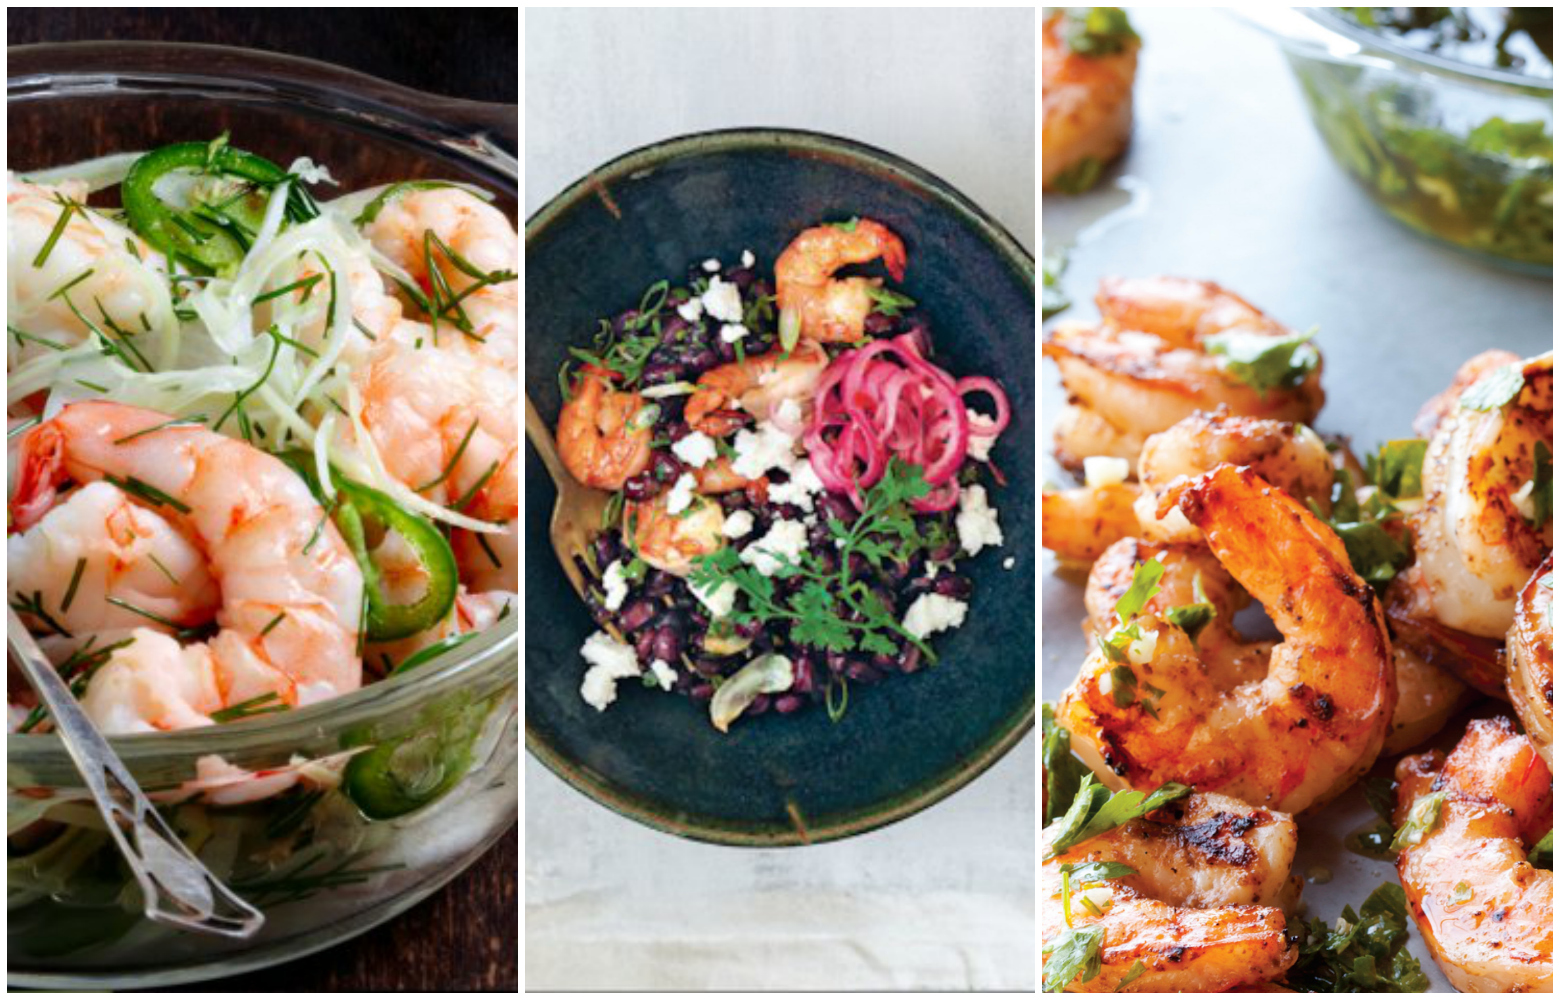 7 Ideas For Dinner Tonight: Shrimp - Food Republic